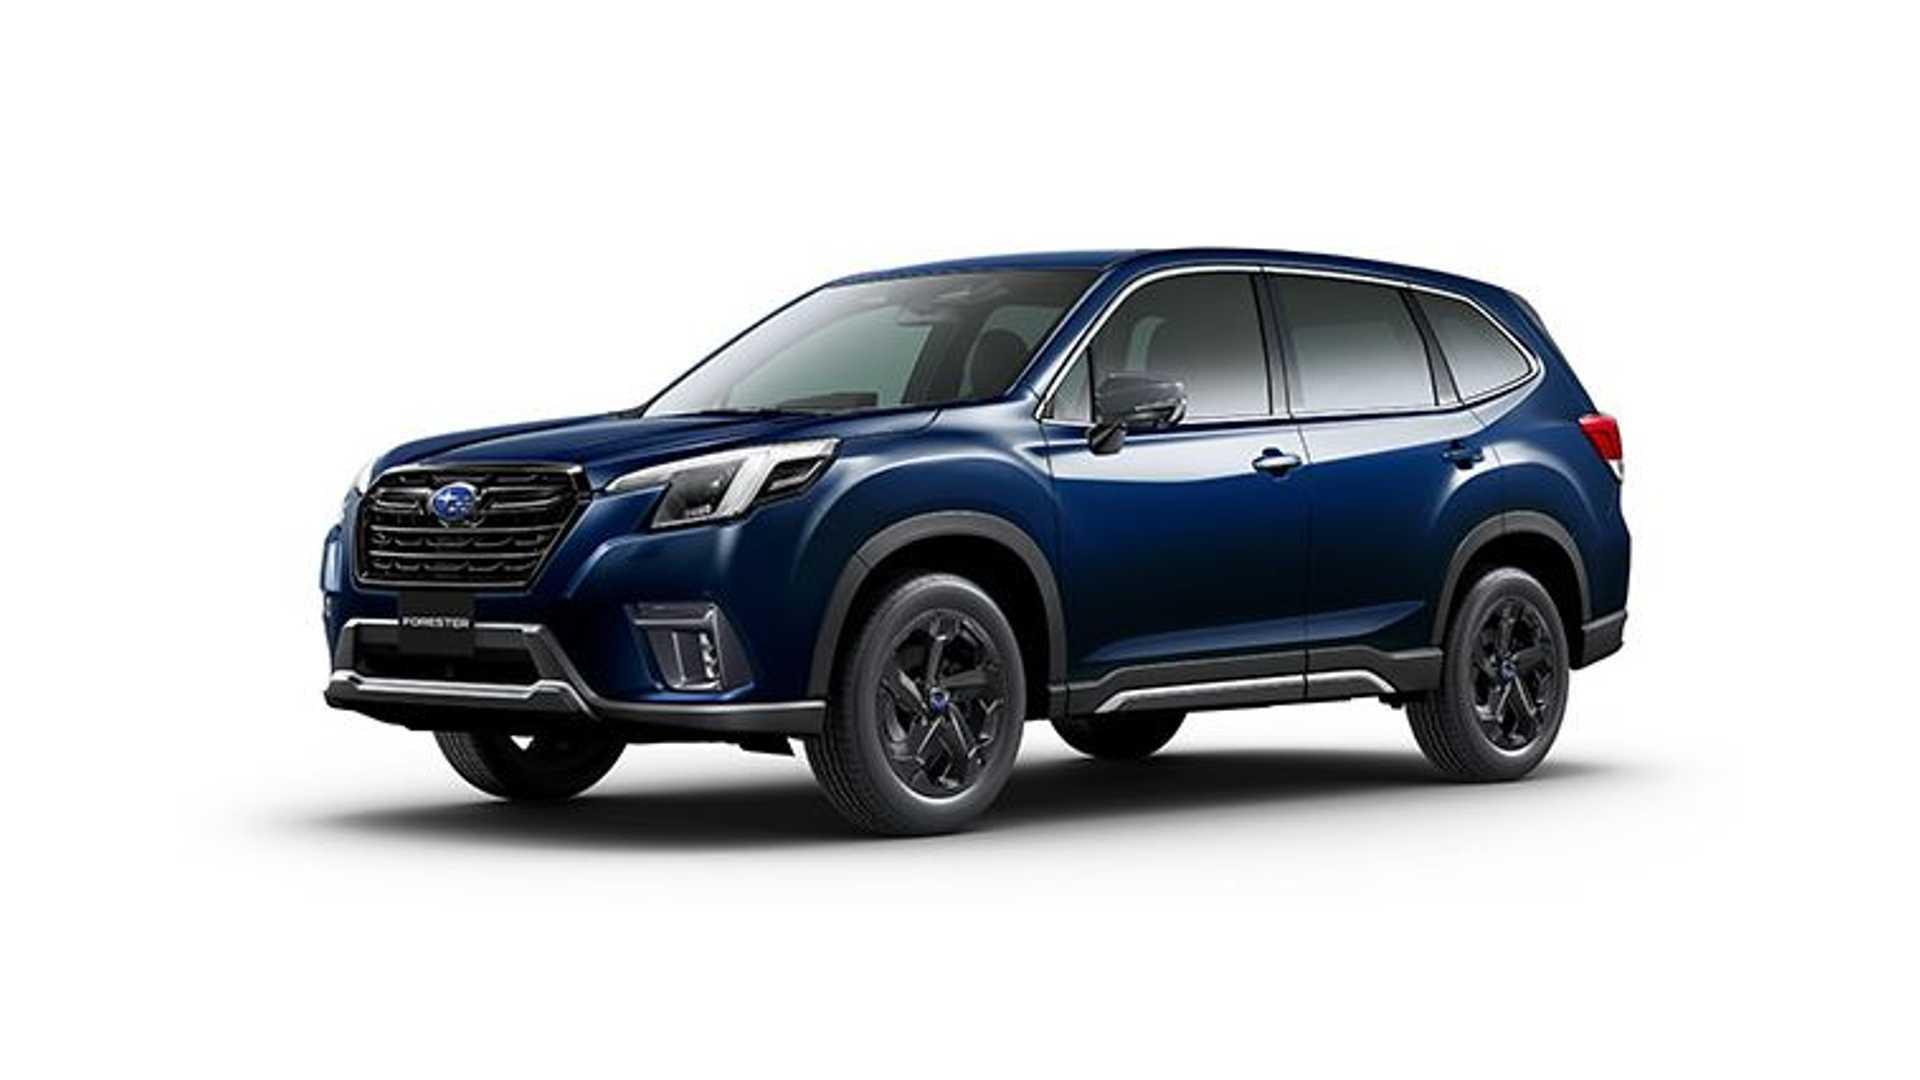 Subaru-Forester-facelift-37